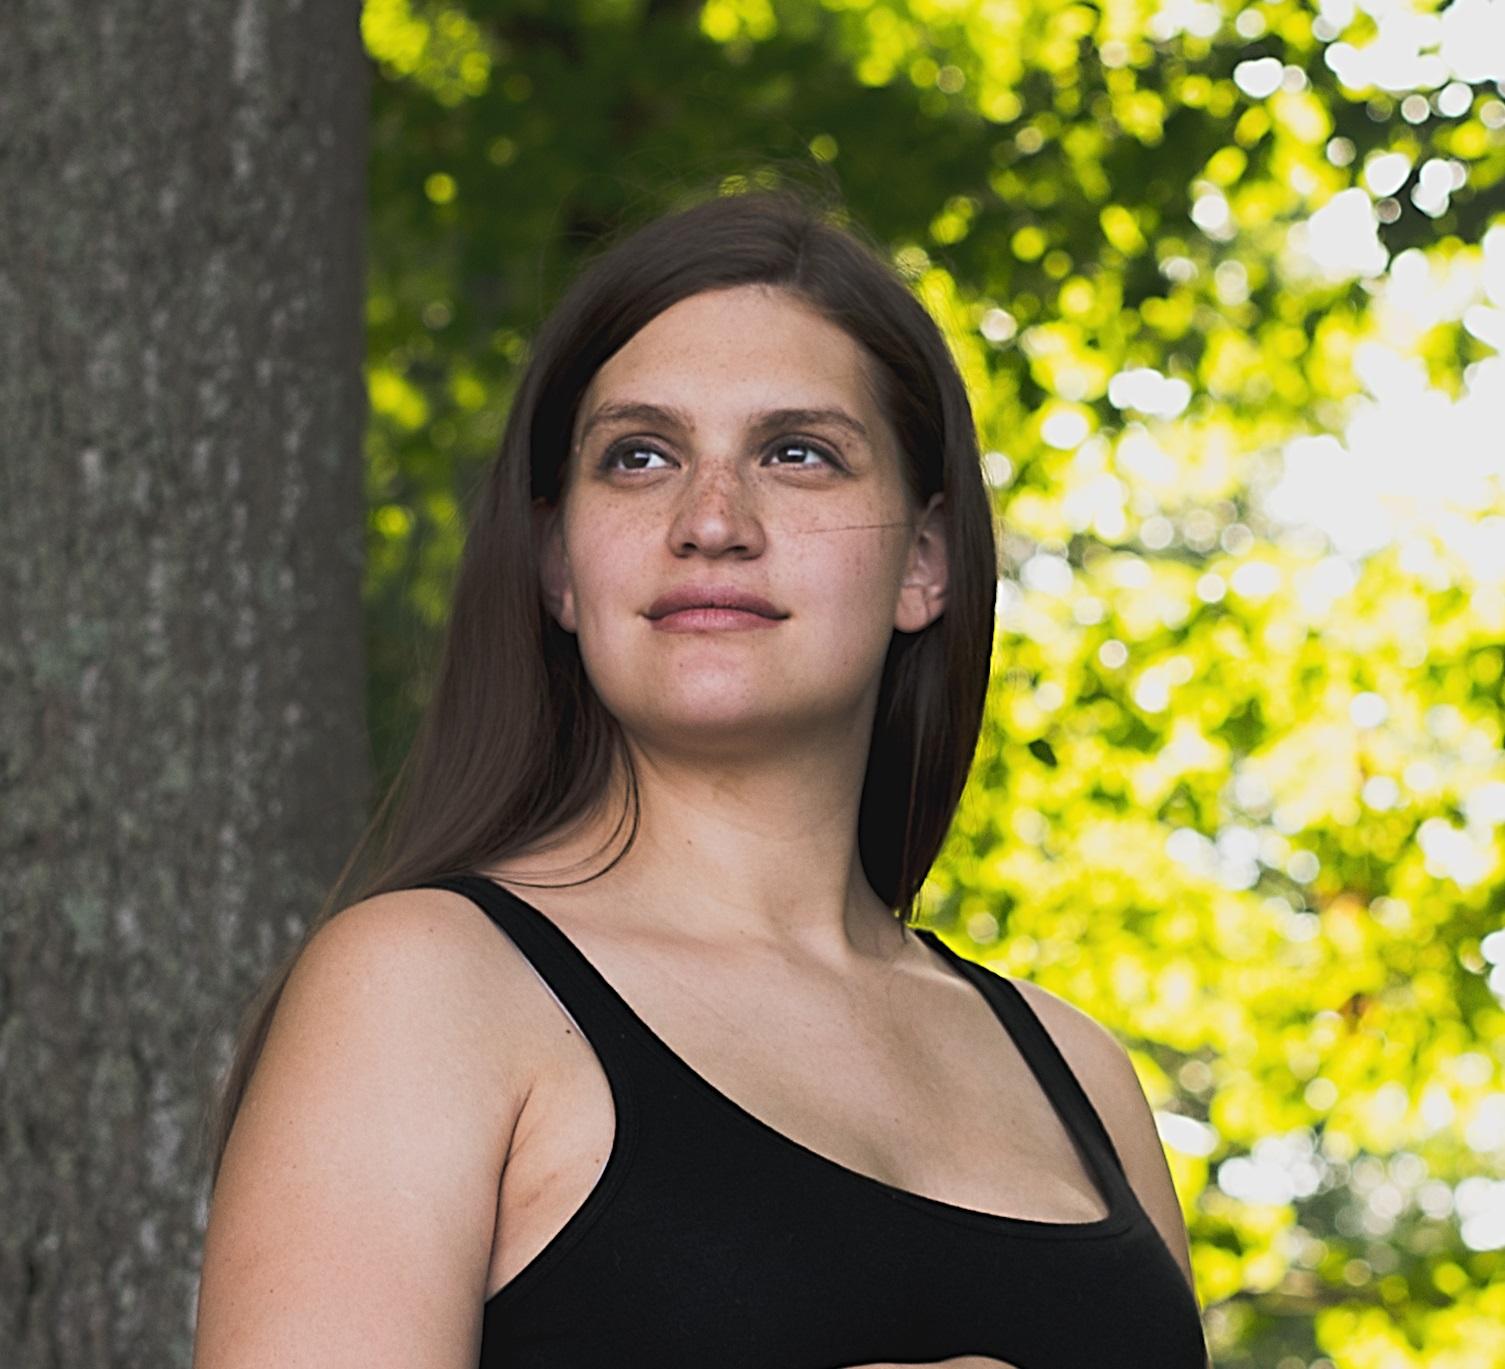 megan pratz  is an international news producer based in Washington, DC. credits include Al Jazeera, PBS and Fox News.  View her work here . Mentorship Beat: Work-Life Balance; Women's Rights; TV & Digital Journalism